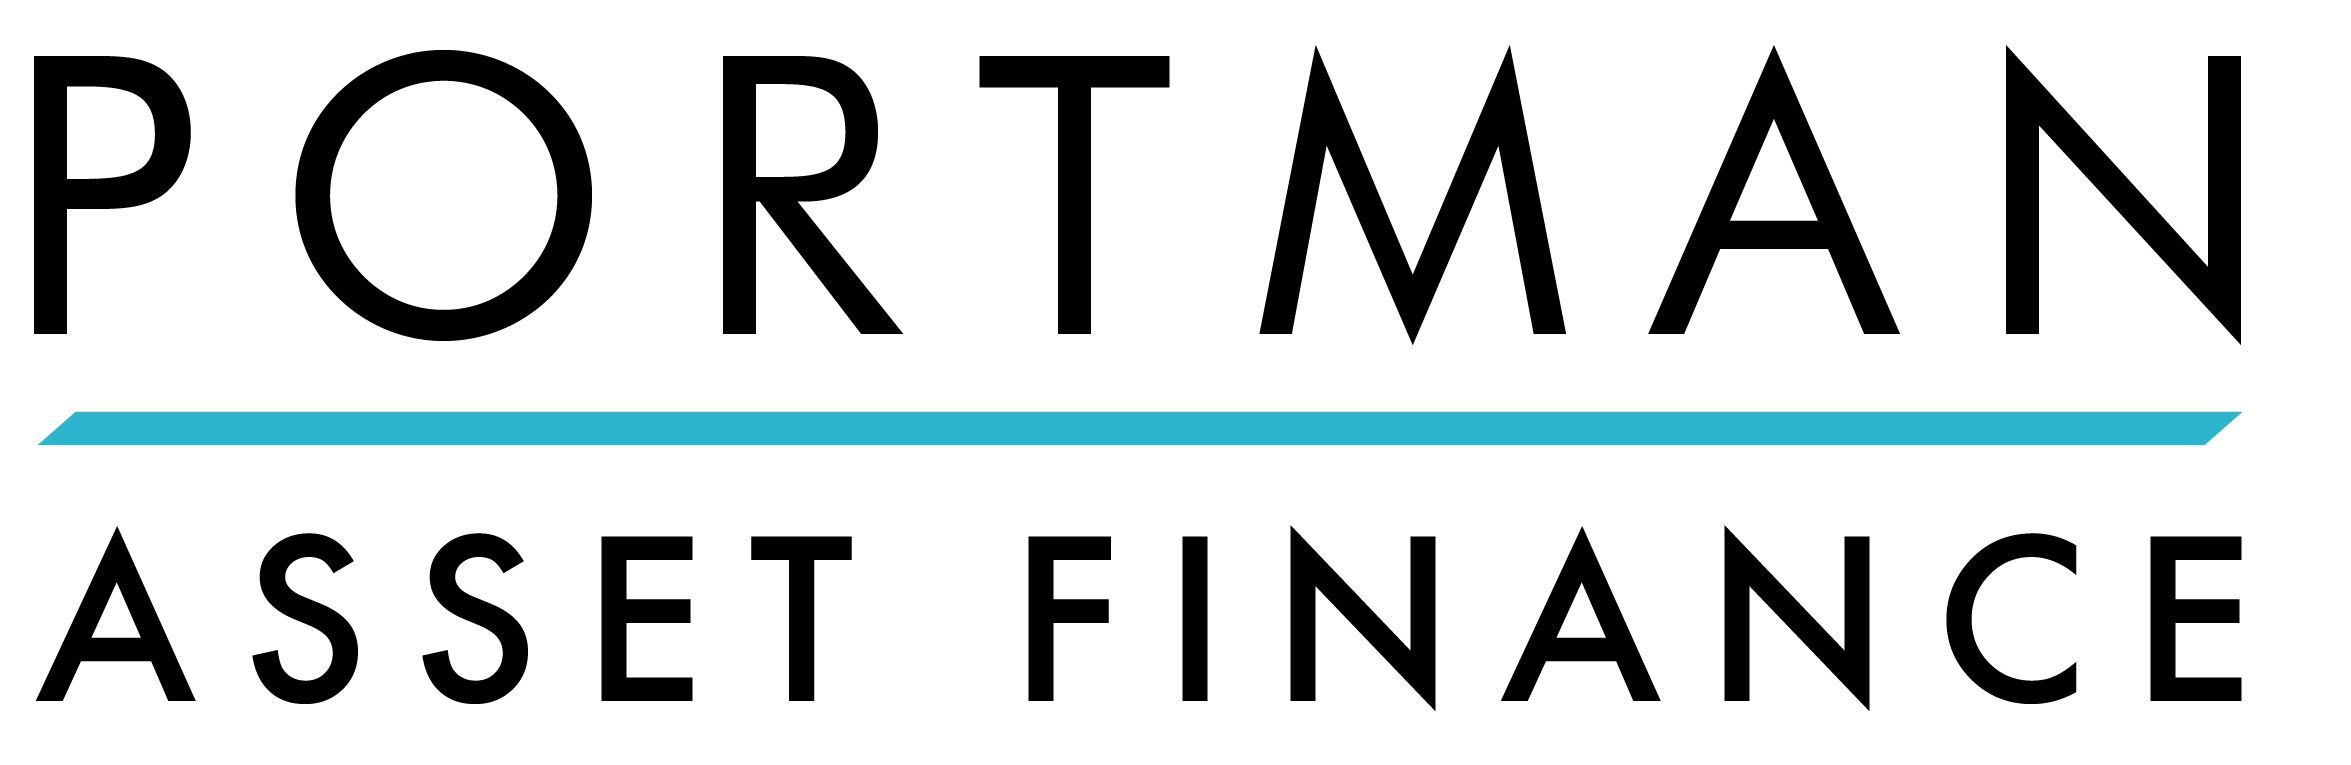 Portman Asset Finance Limited